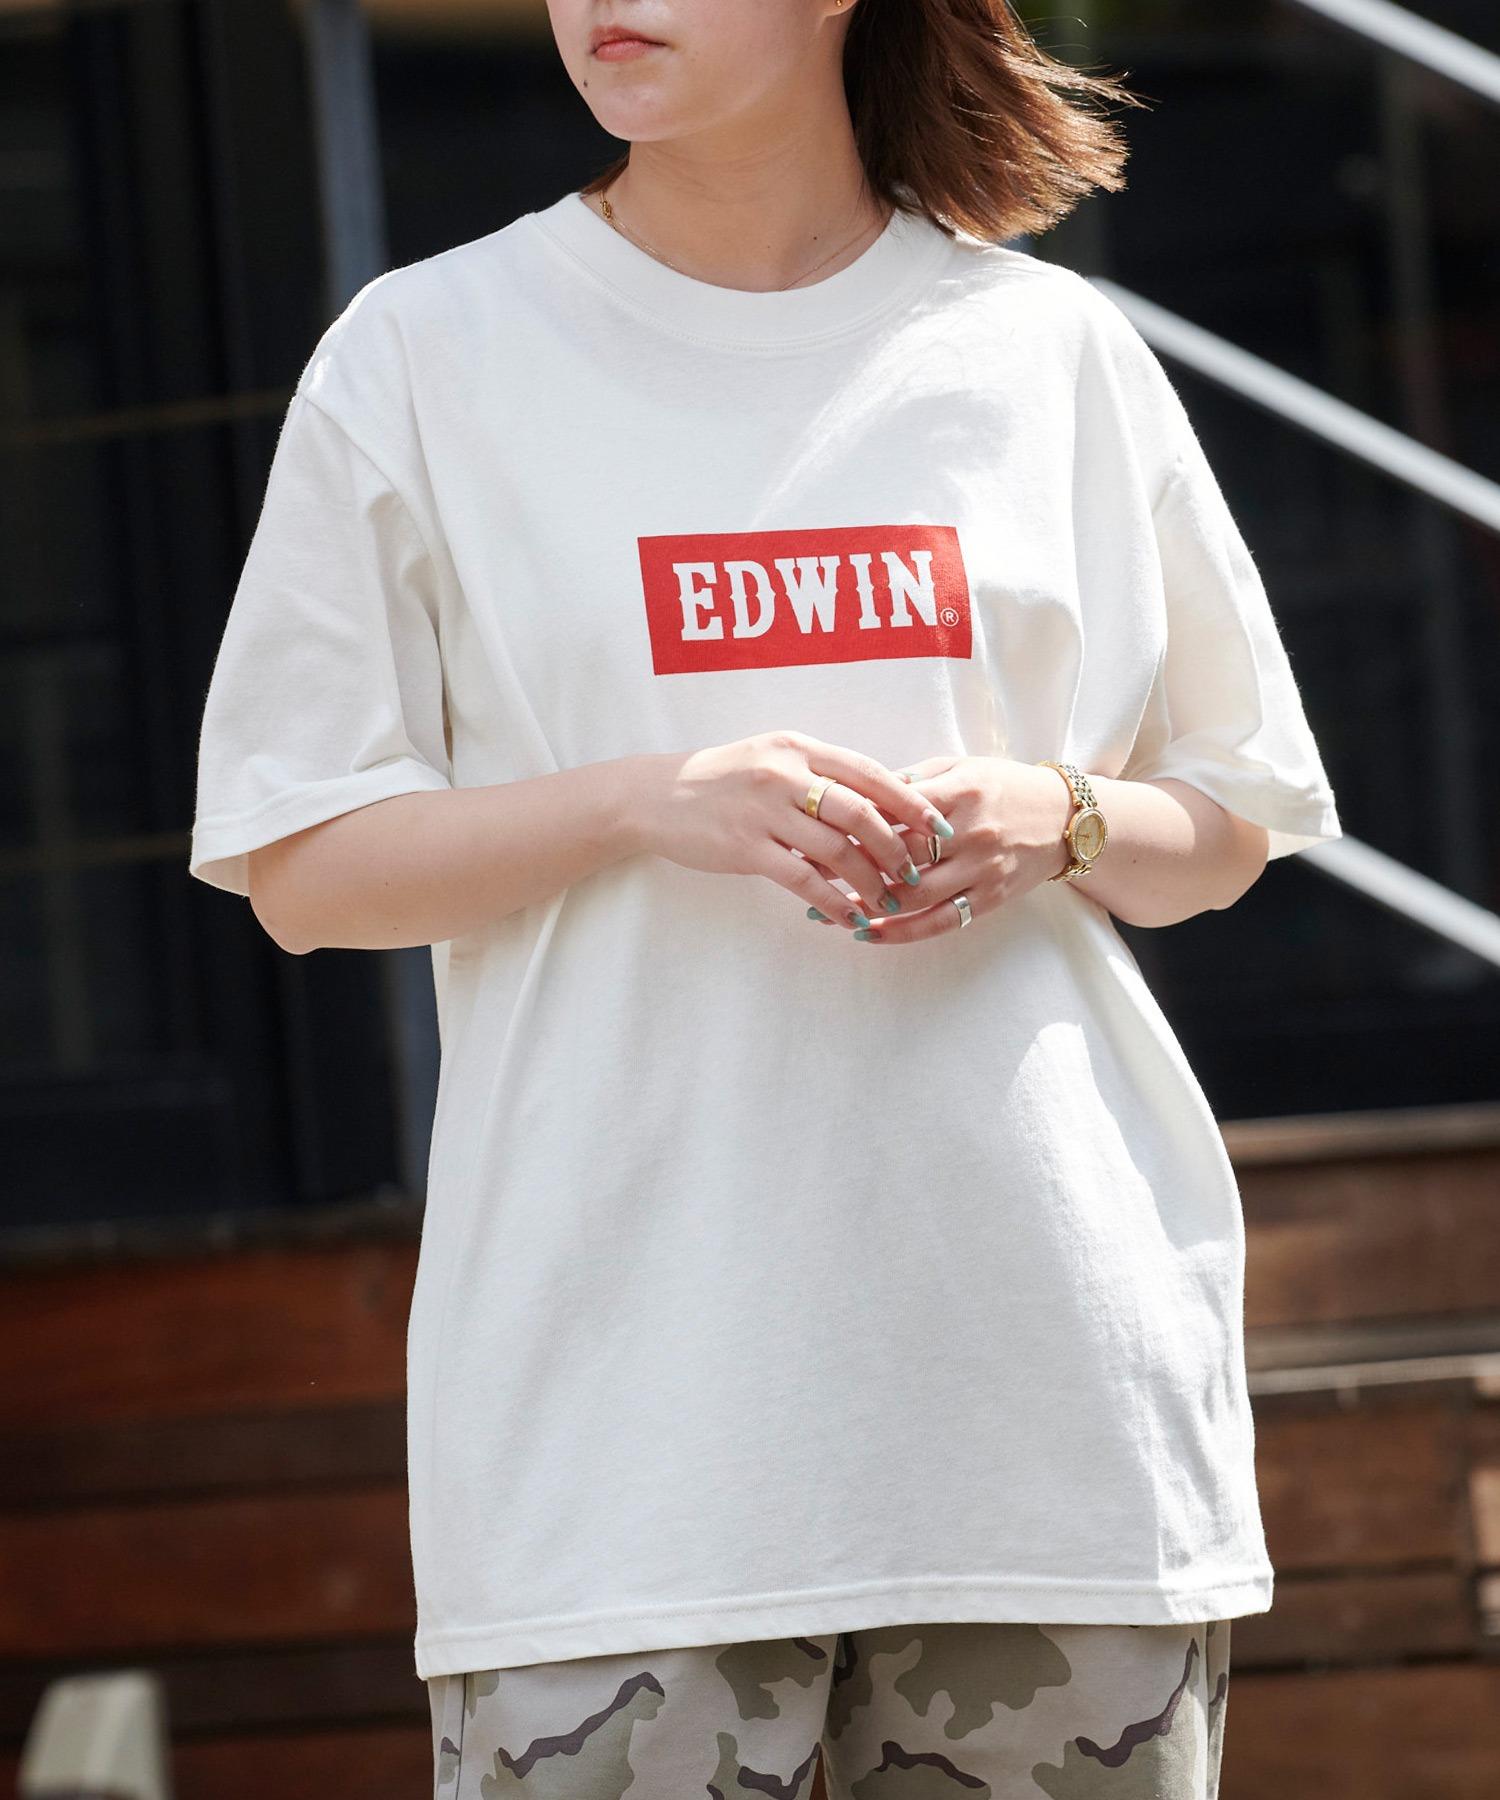 EDWIN/エドウィン BASIC PRINT H/S TEE BOXロゴプリント半袖Tシャツ